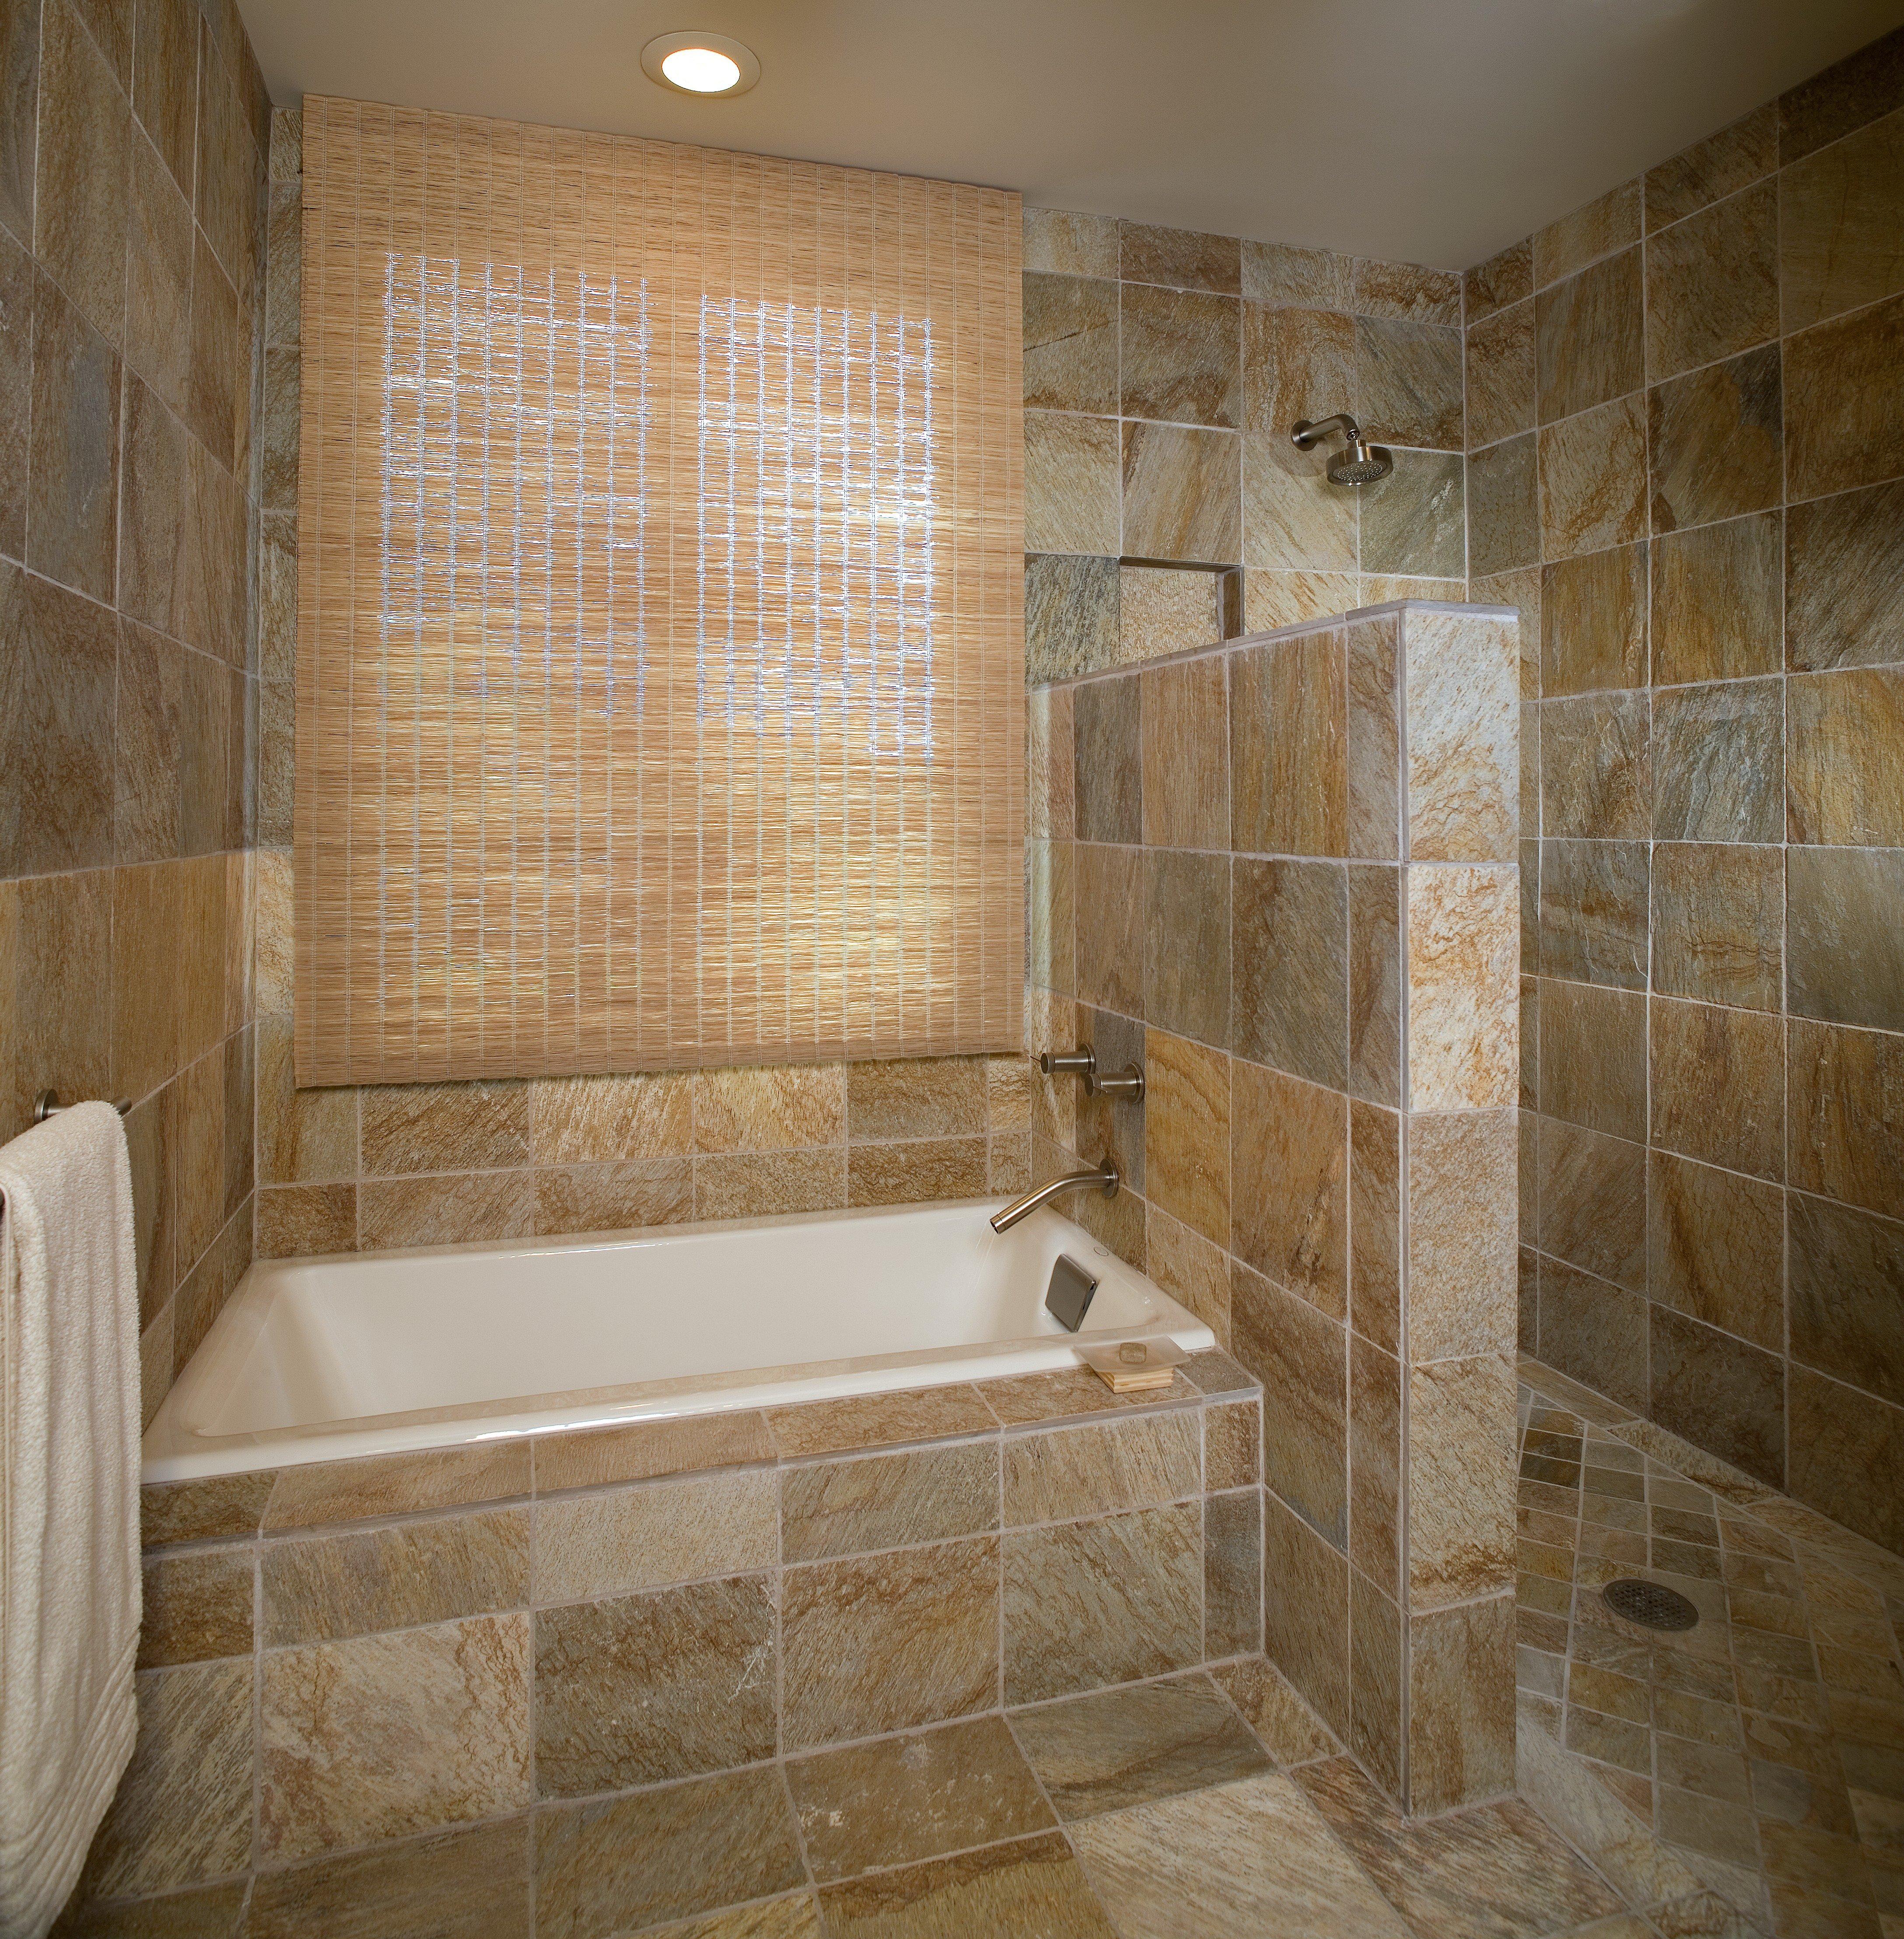 Bathroom remodeling where money is spent on bathroom remodeling JGRZARM